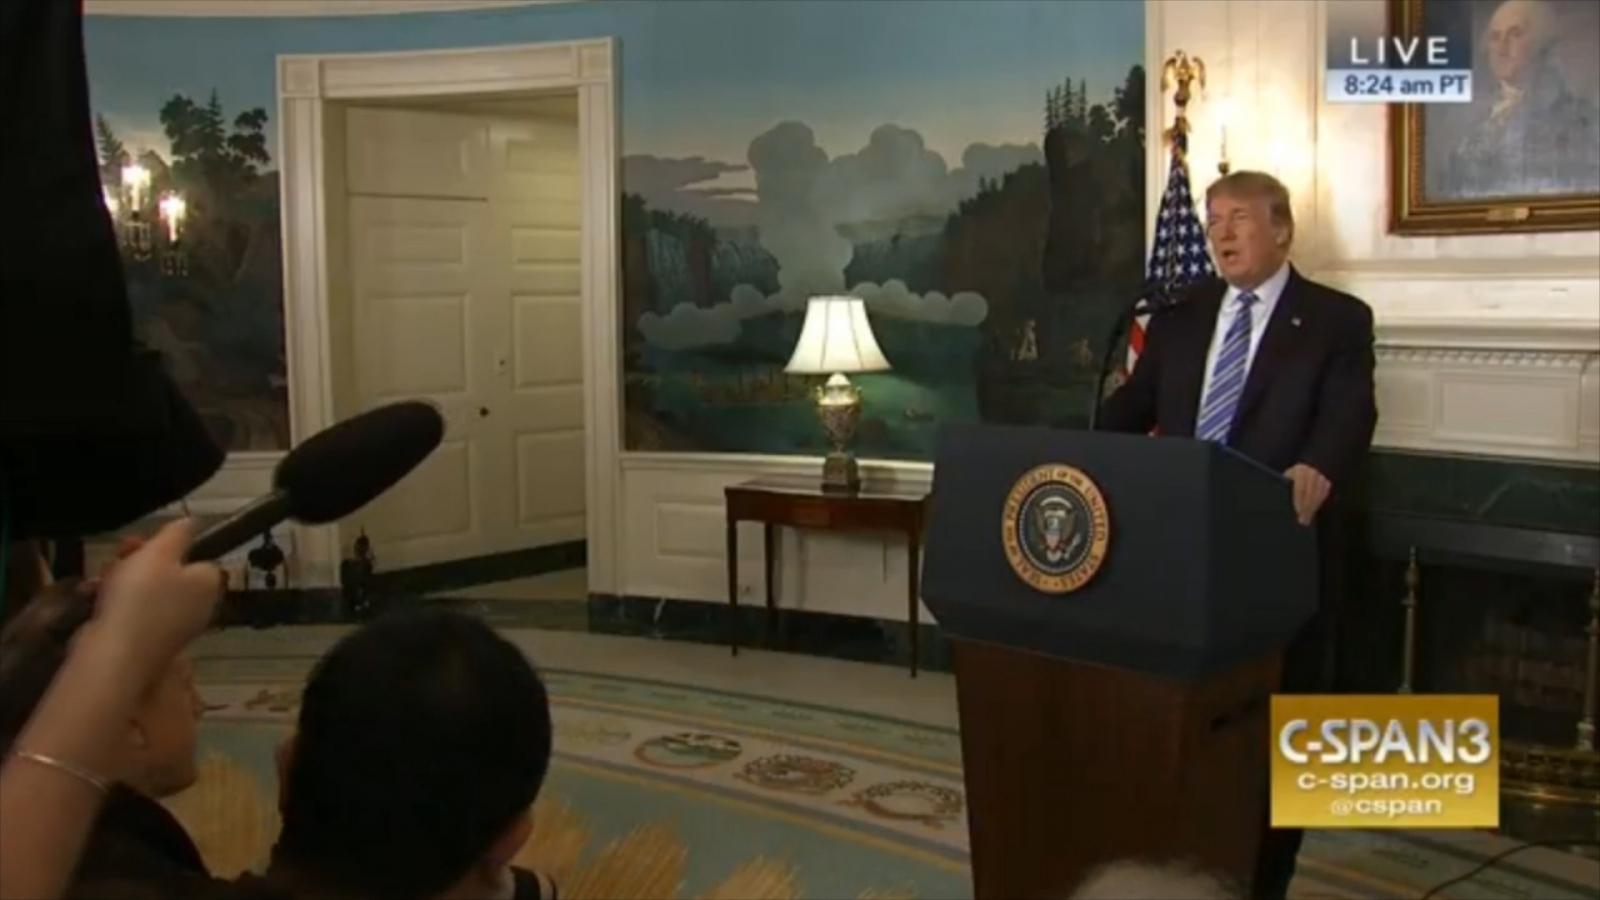 President Trump Announces Plans To Visit Parkland, Florida After Deadly School Shooting